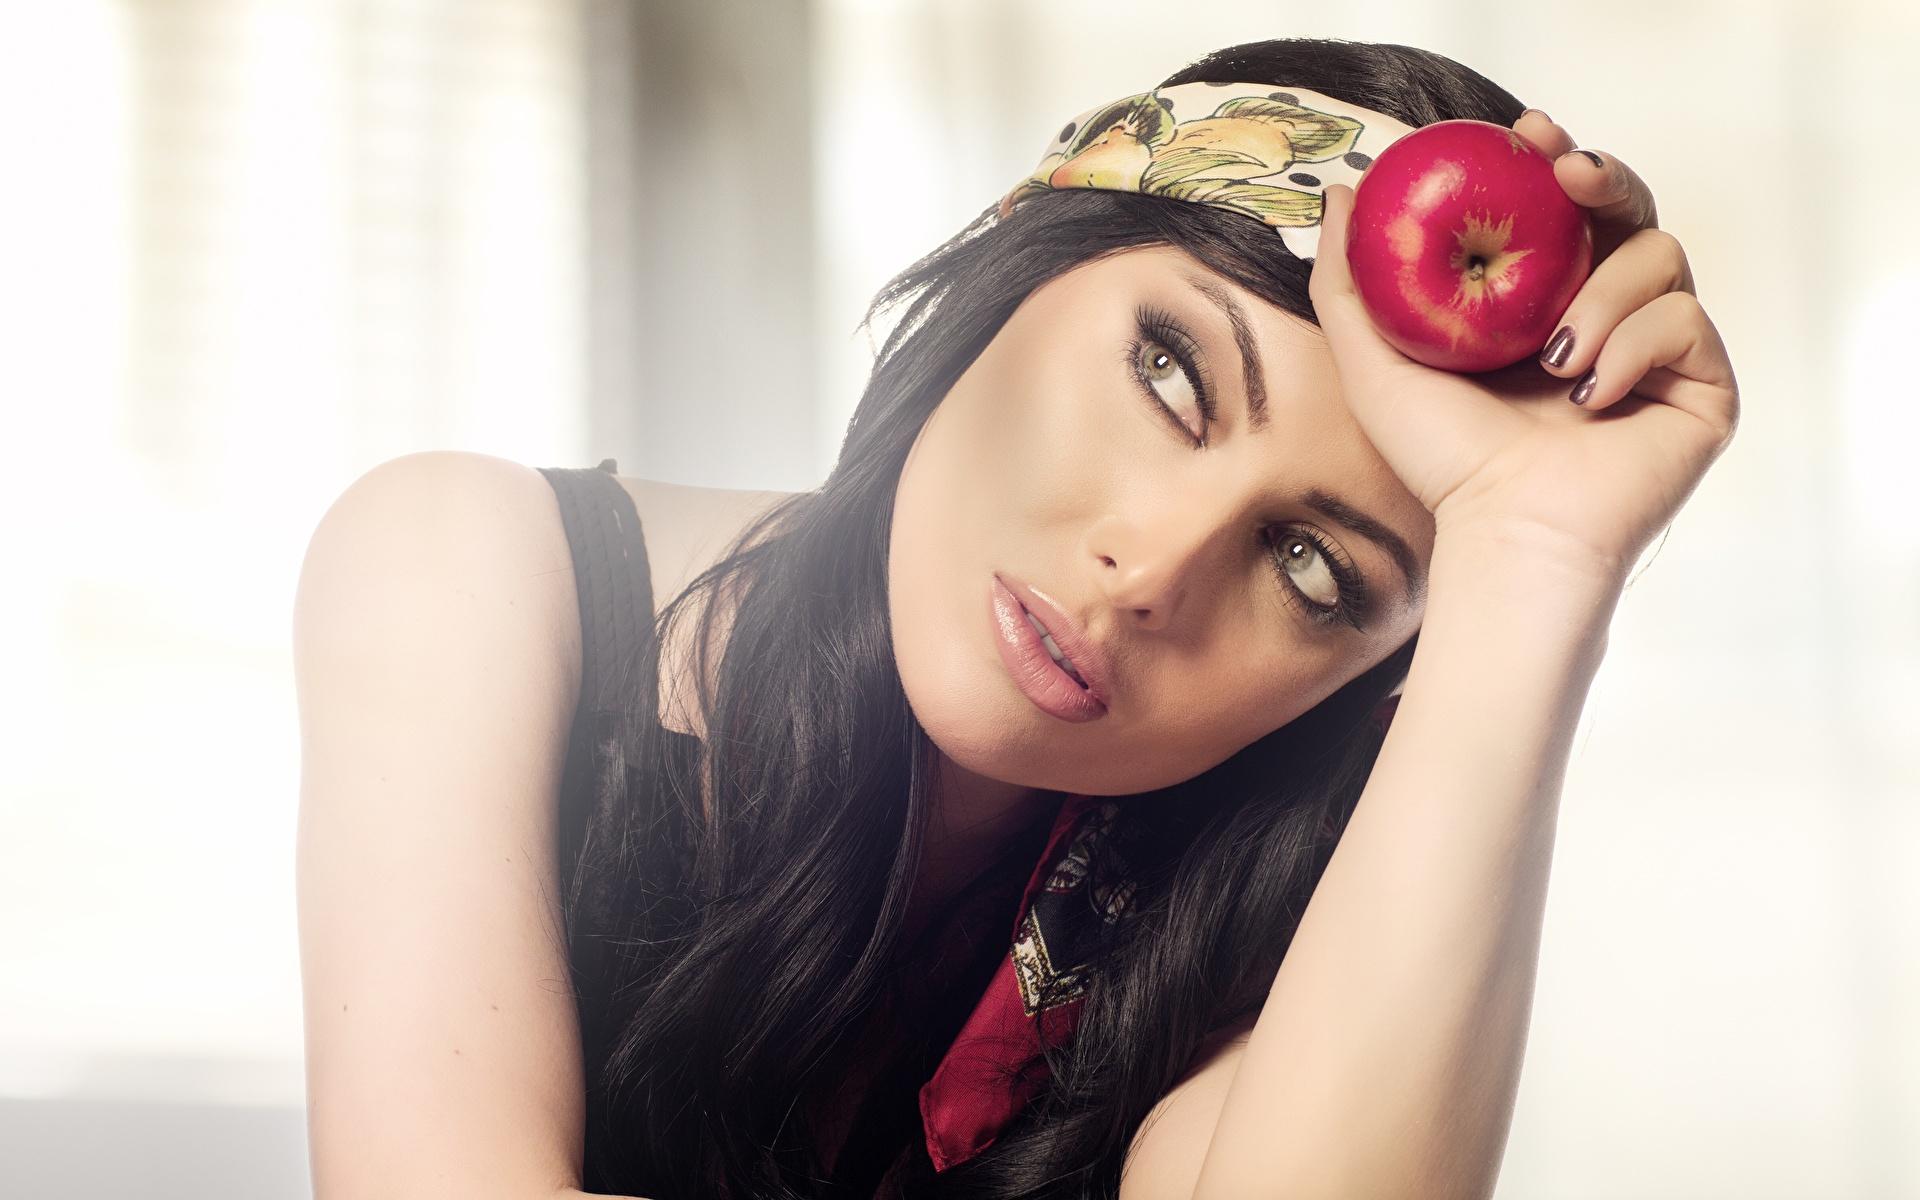 Bilder Brünette Schminke Mädchens Äpfel Lebensmittel Blick 1920x1200 Make Up junge frau junge Frauen das Essen Starren